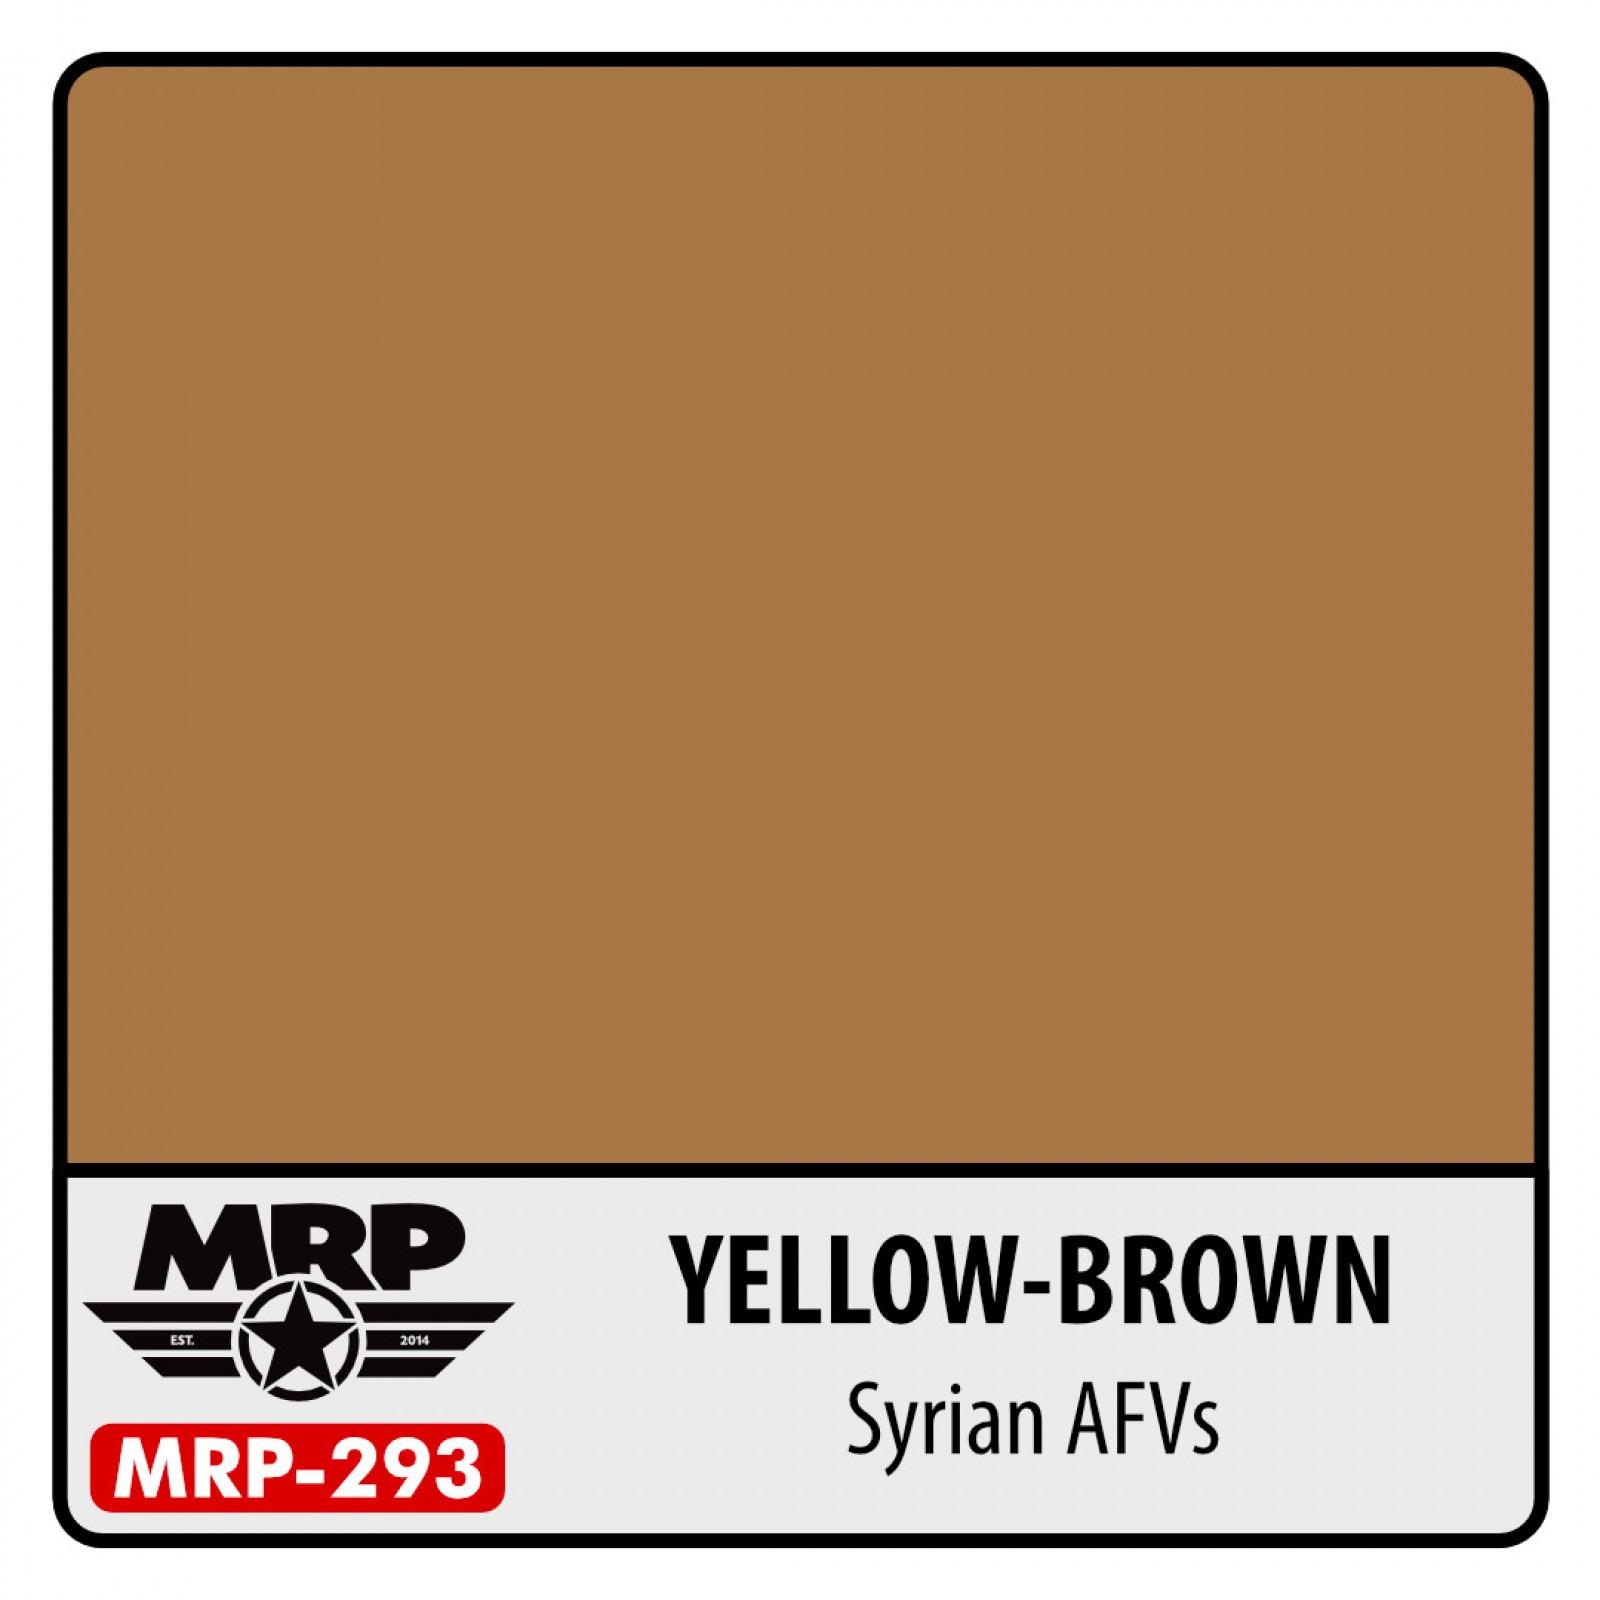 MRP-293  YELLOW BROWN  Syrian AFVs